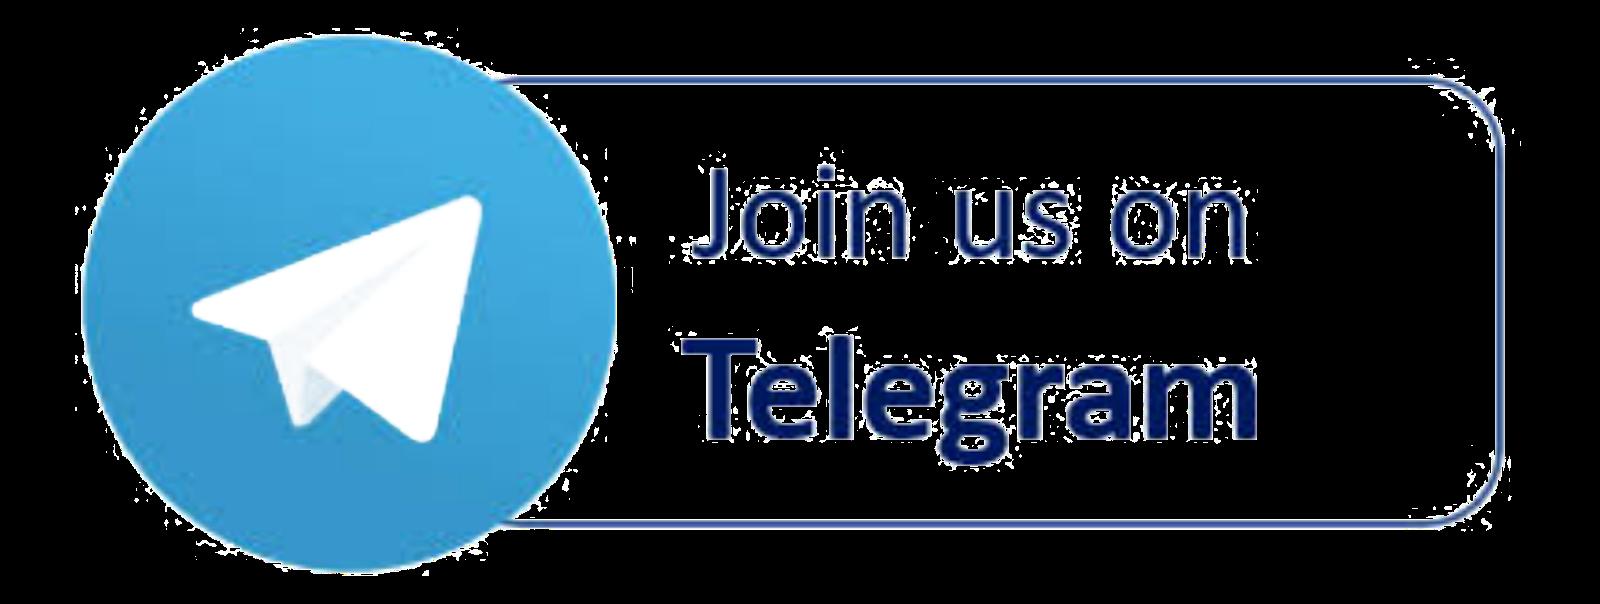 Http injector cheat telegram group